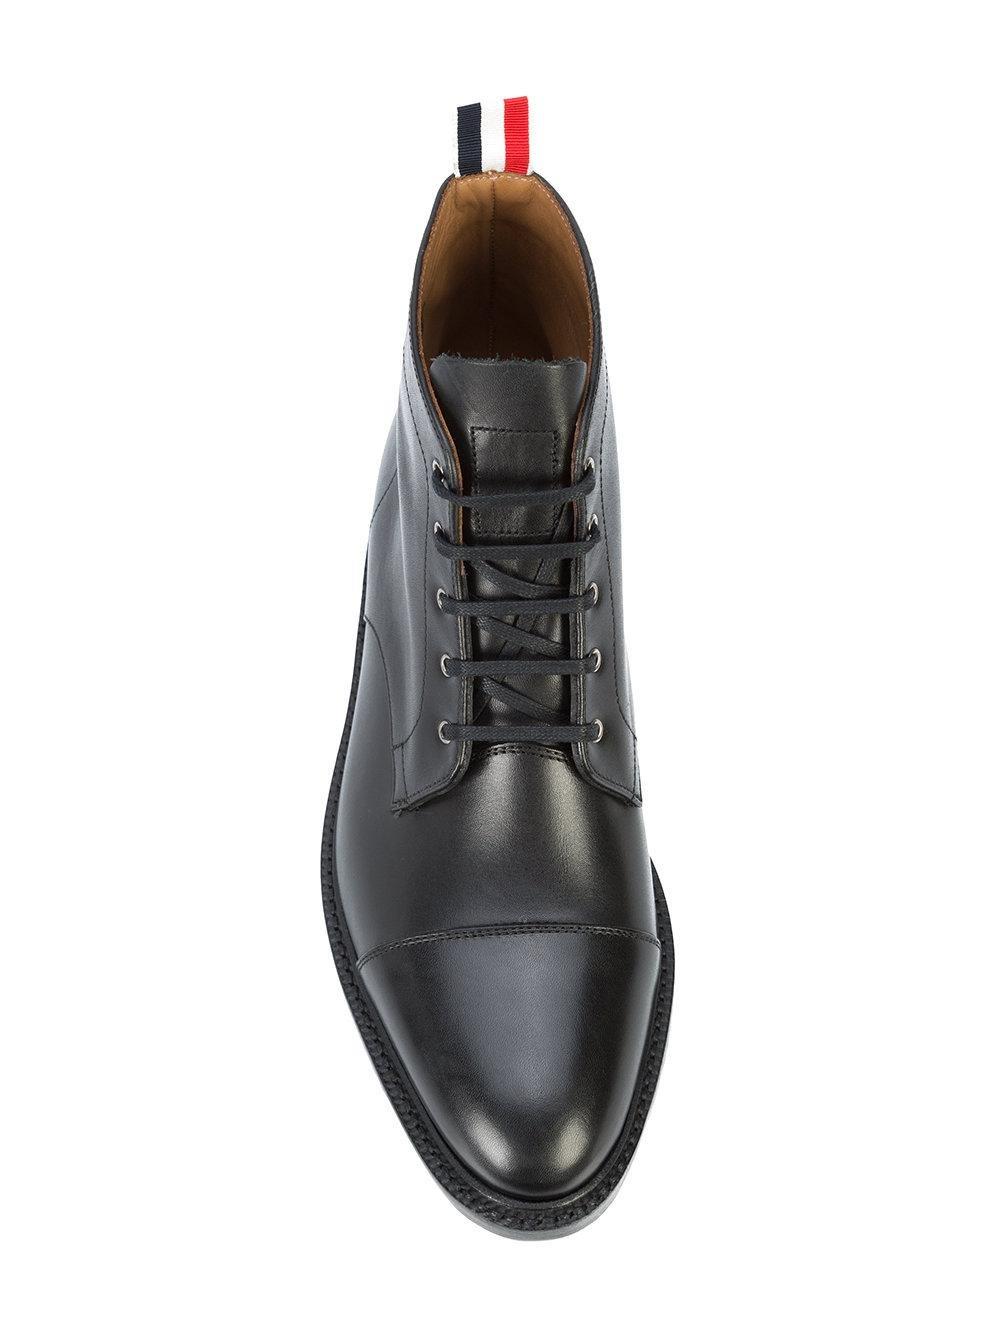 Black Cropped Derby Boots Thom Browne Geniue Stockist Cheap Online RHvxVaj